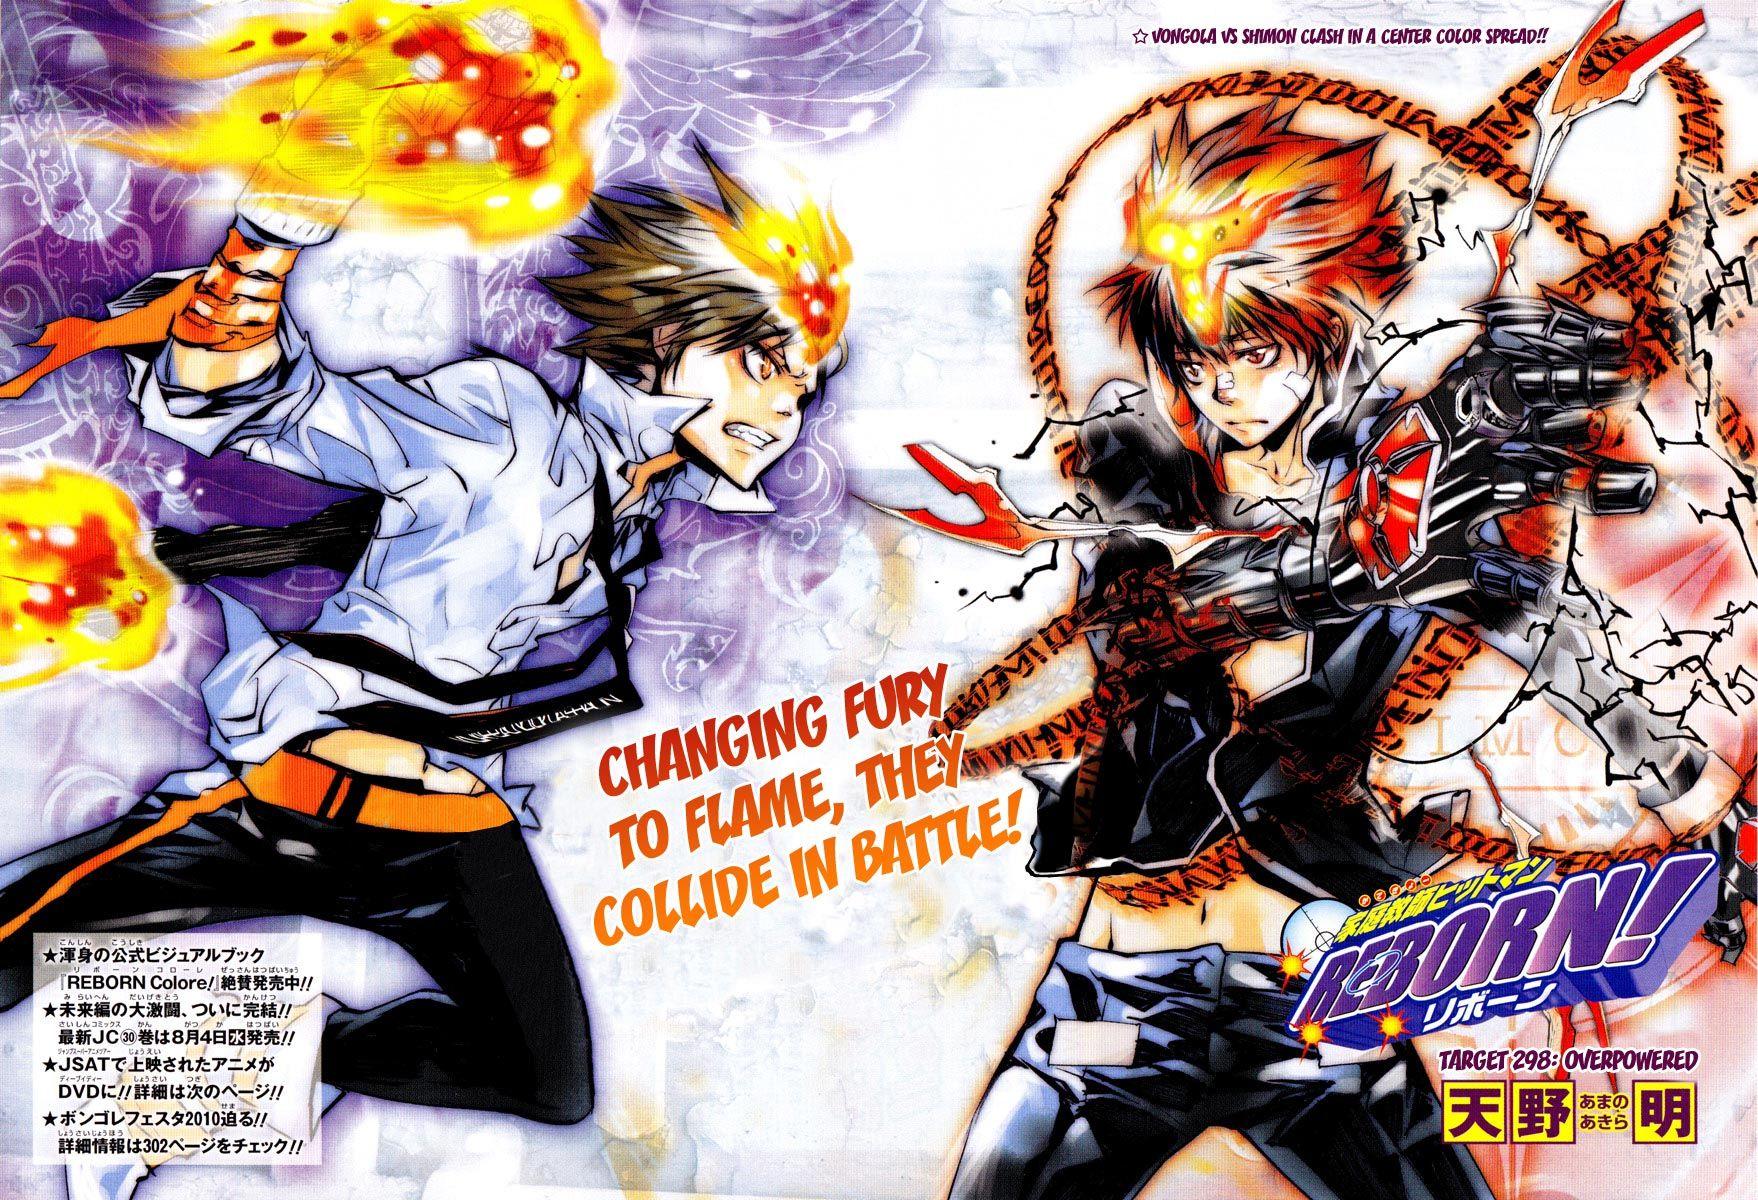 Tsuna VS Enma Personajes, Cómics, Animes buenos